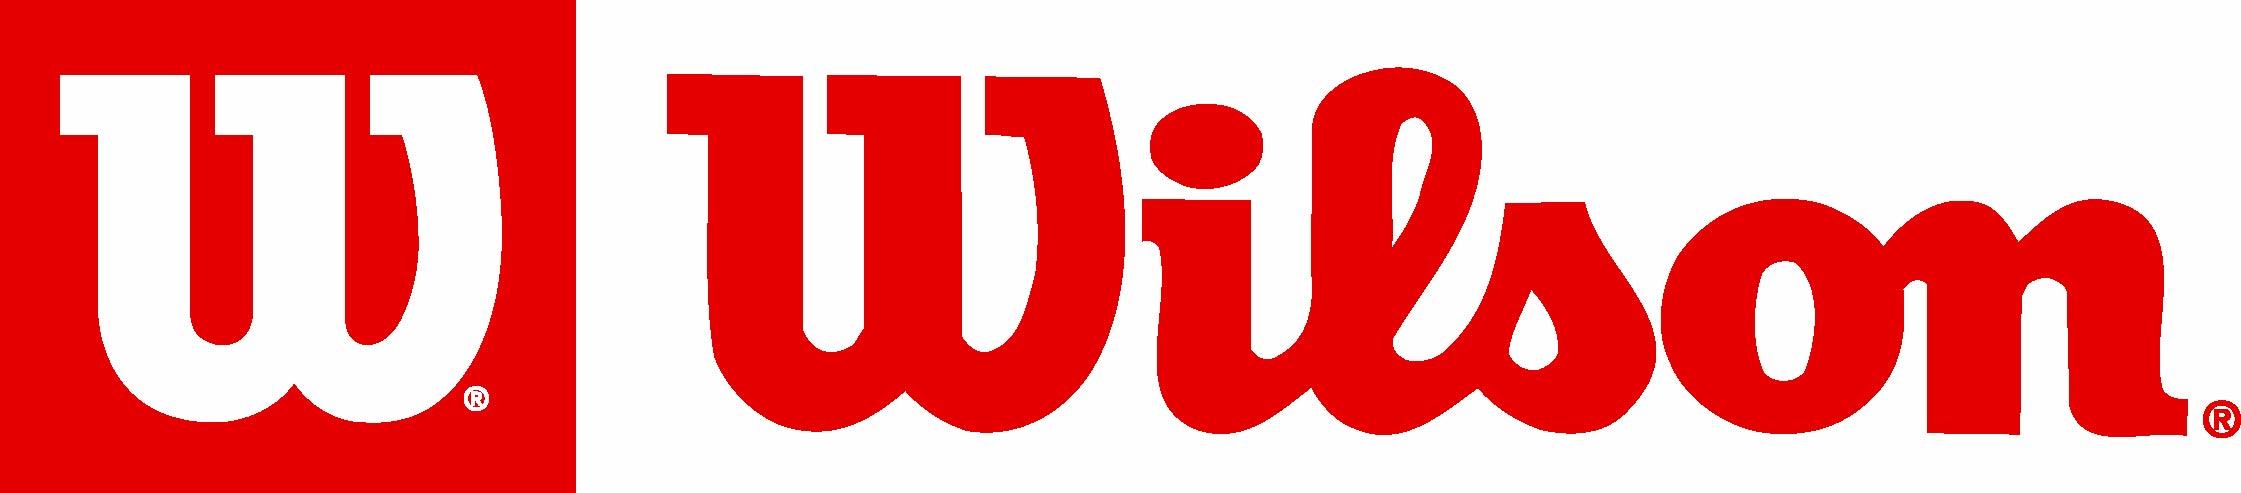 http://www.sport-factory.ch/images/logos_produkte/wilson.jpg